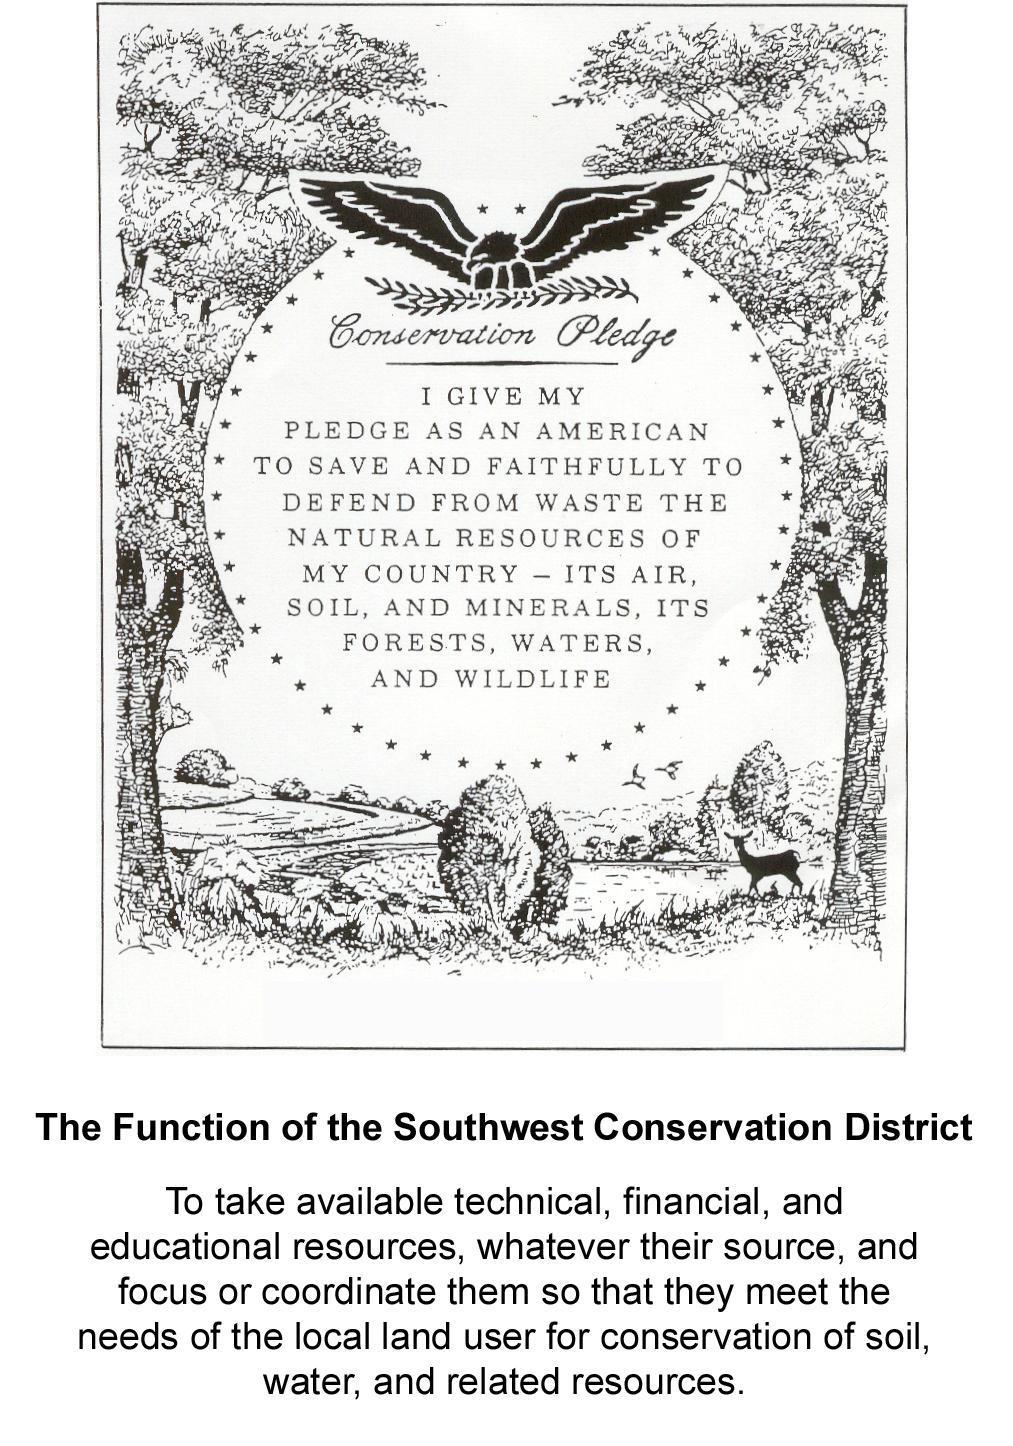 Southwest Conservation District